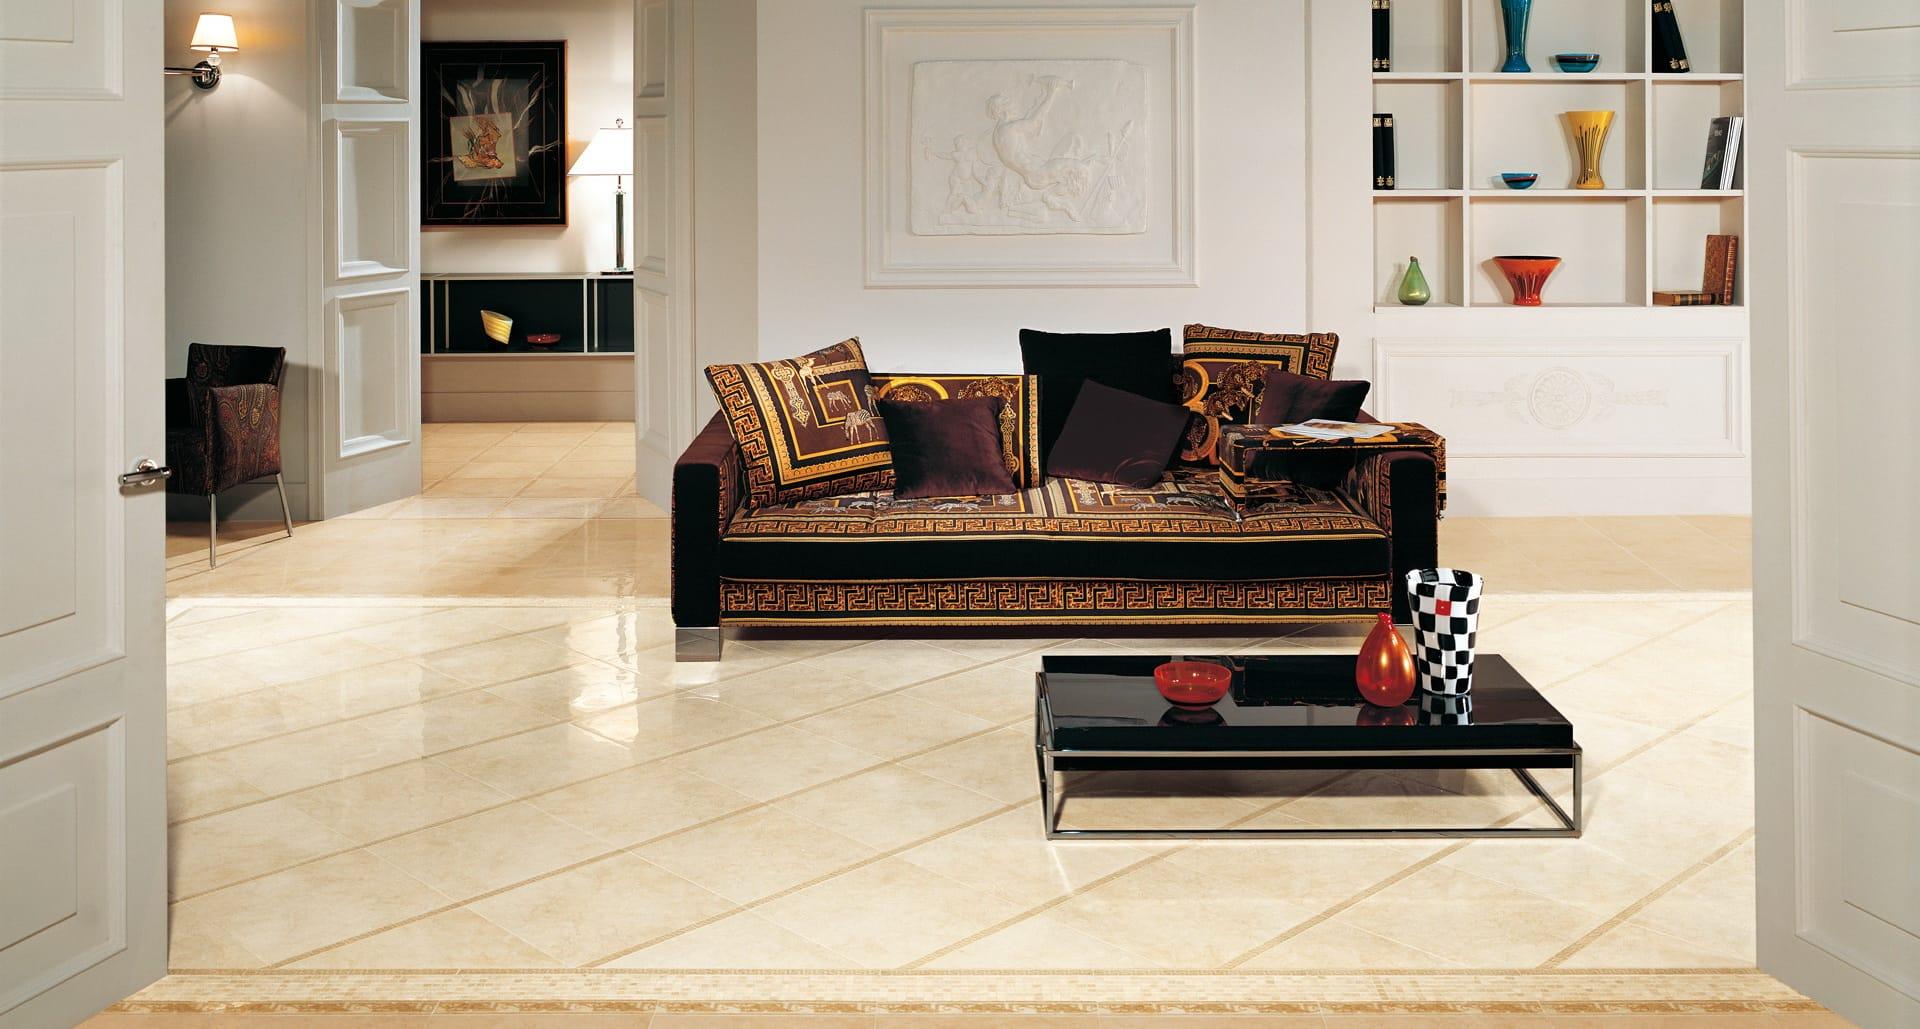 Versace Tiles Luxurious Fashion